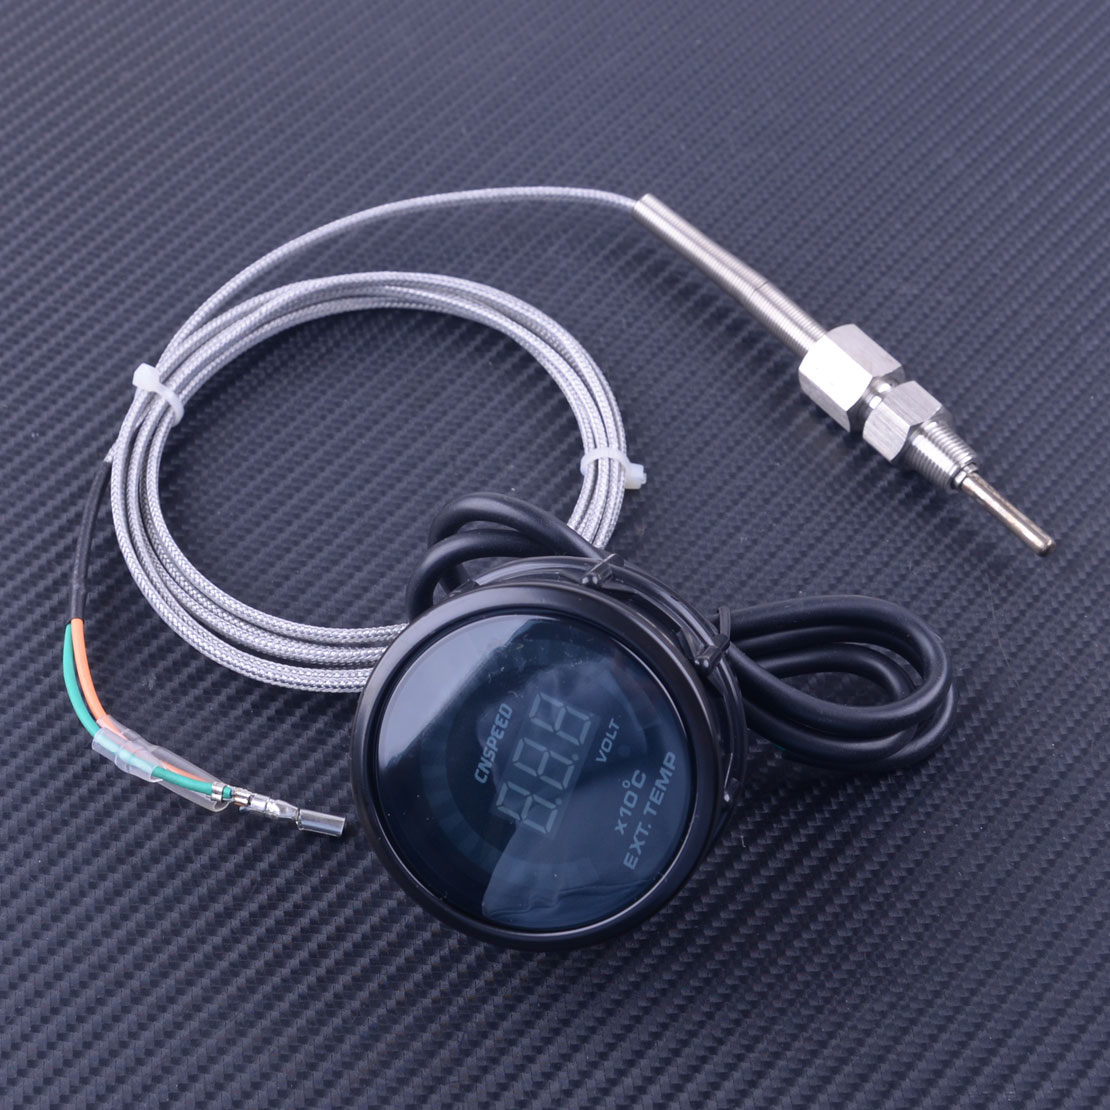 "ADWCX Universal 2 ""52mm DC 12V LED Digital de la temperatura del Gas de escape EGT Indicador de temperatura del Sensor del medidor de Monitor accesorios de Interior de coche"